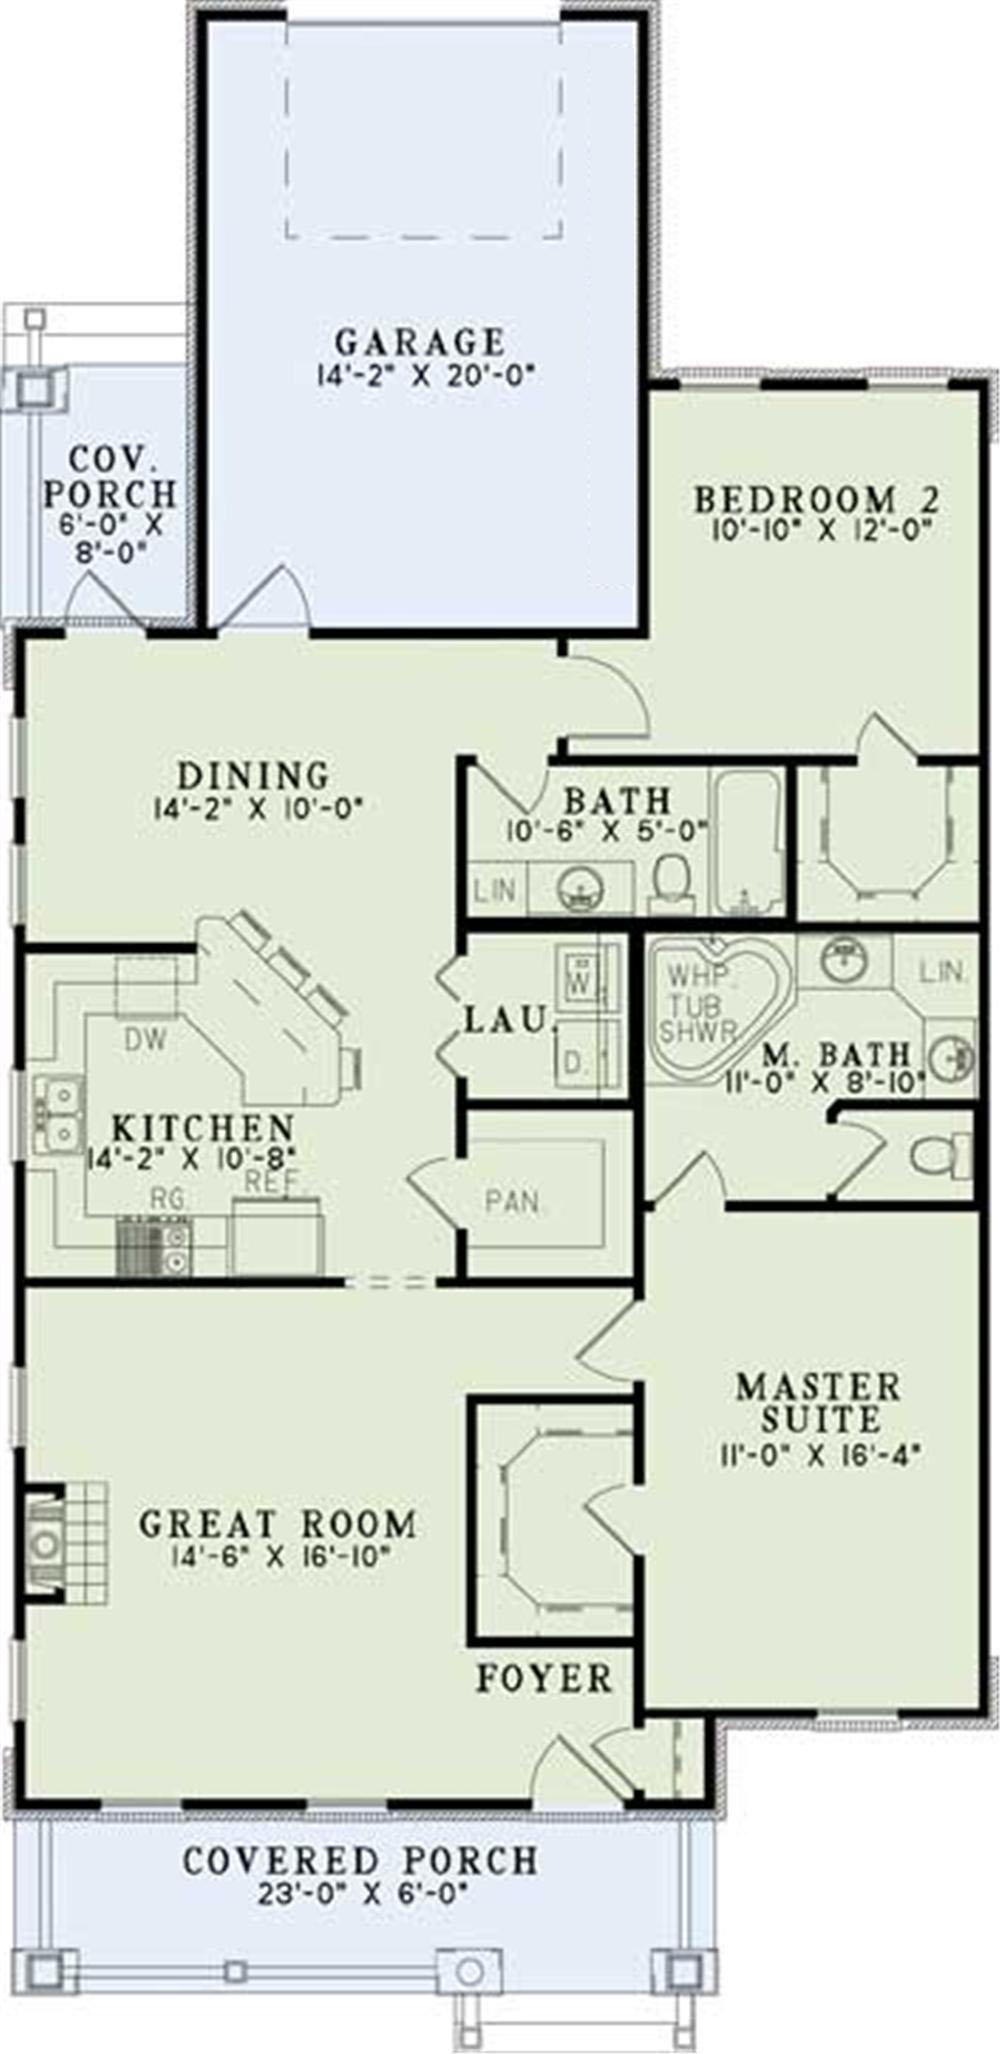 Bungalow House Plan 2 Bedrms 2 Baths 1309 Sq Ft